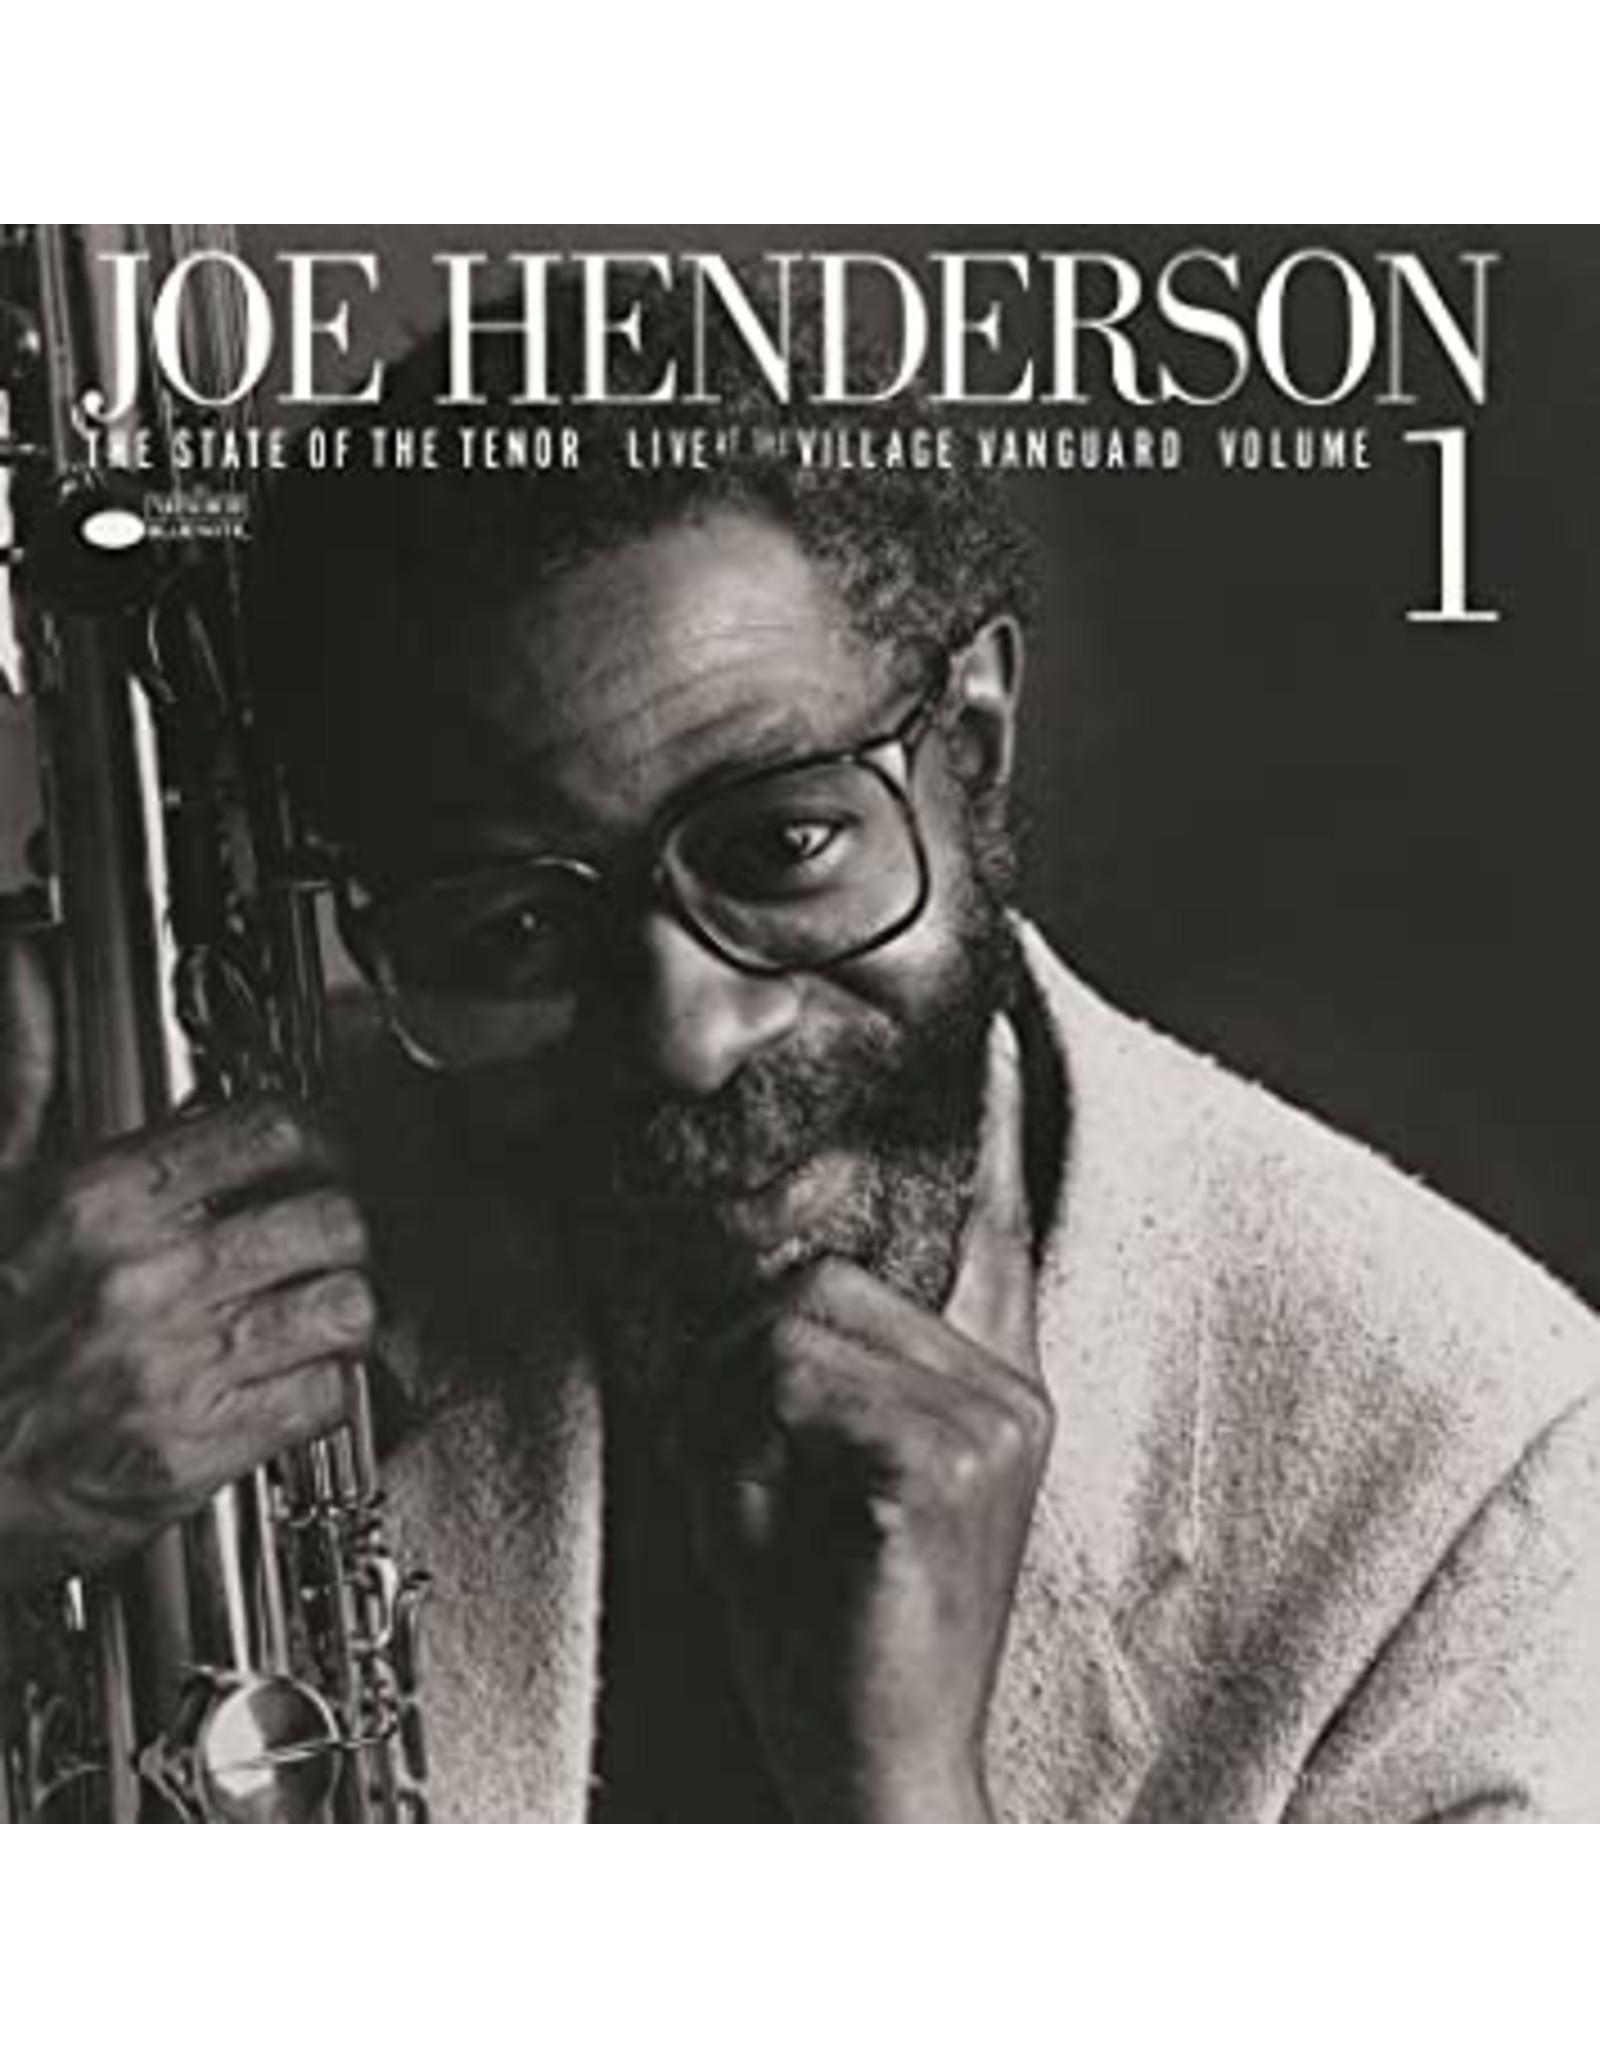 New Vinyl Joe Henderson - State Of The Tenor Vol. 1 LP